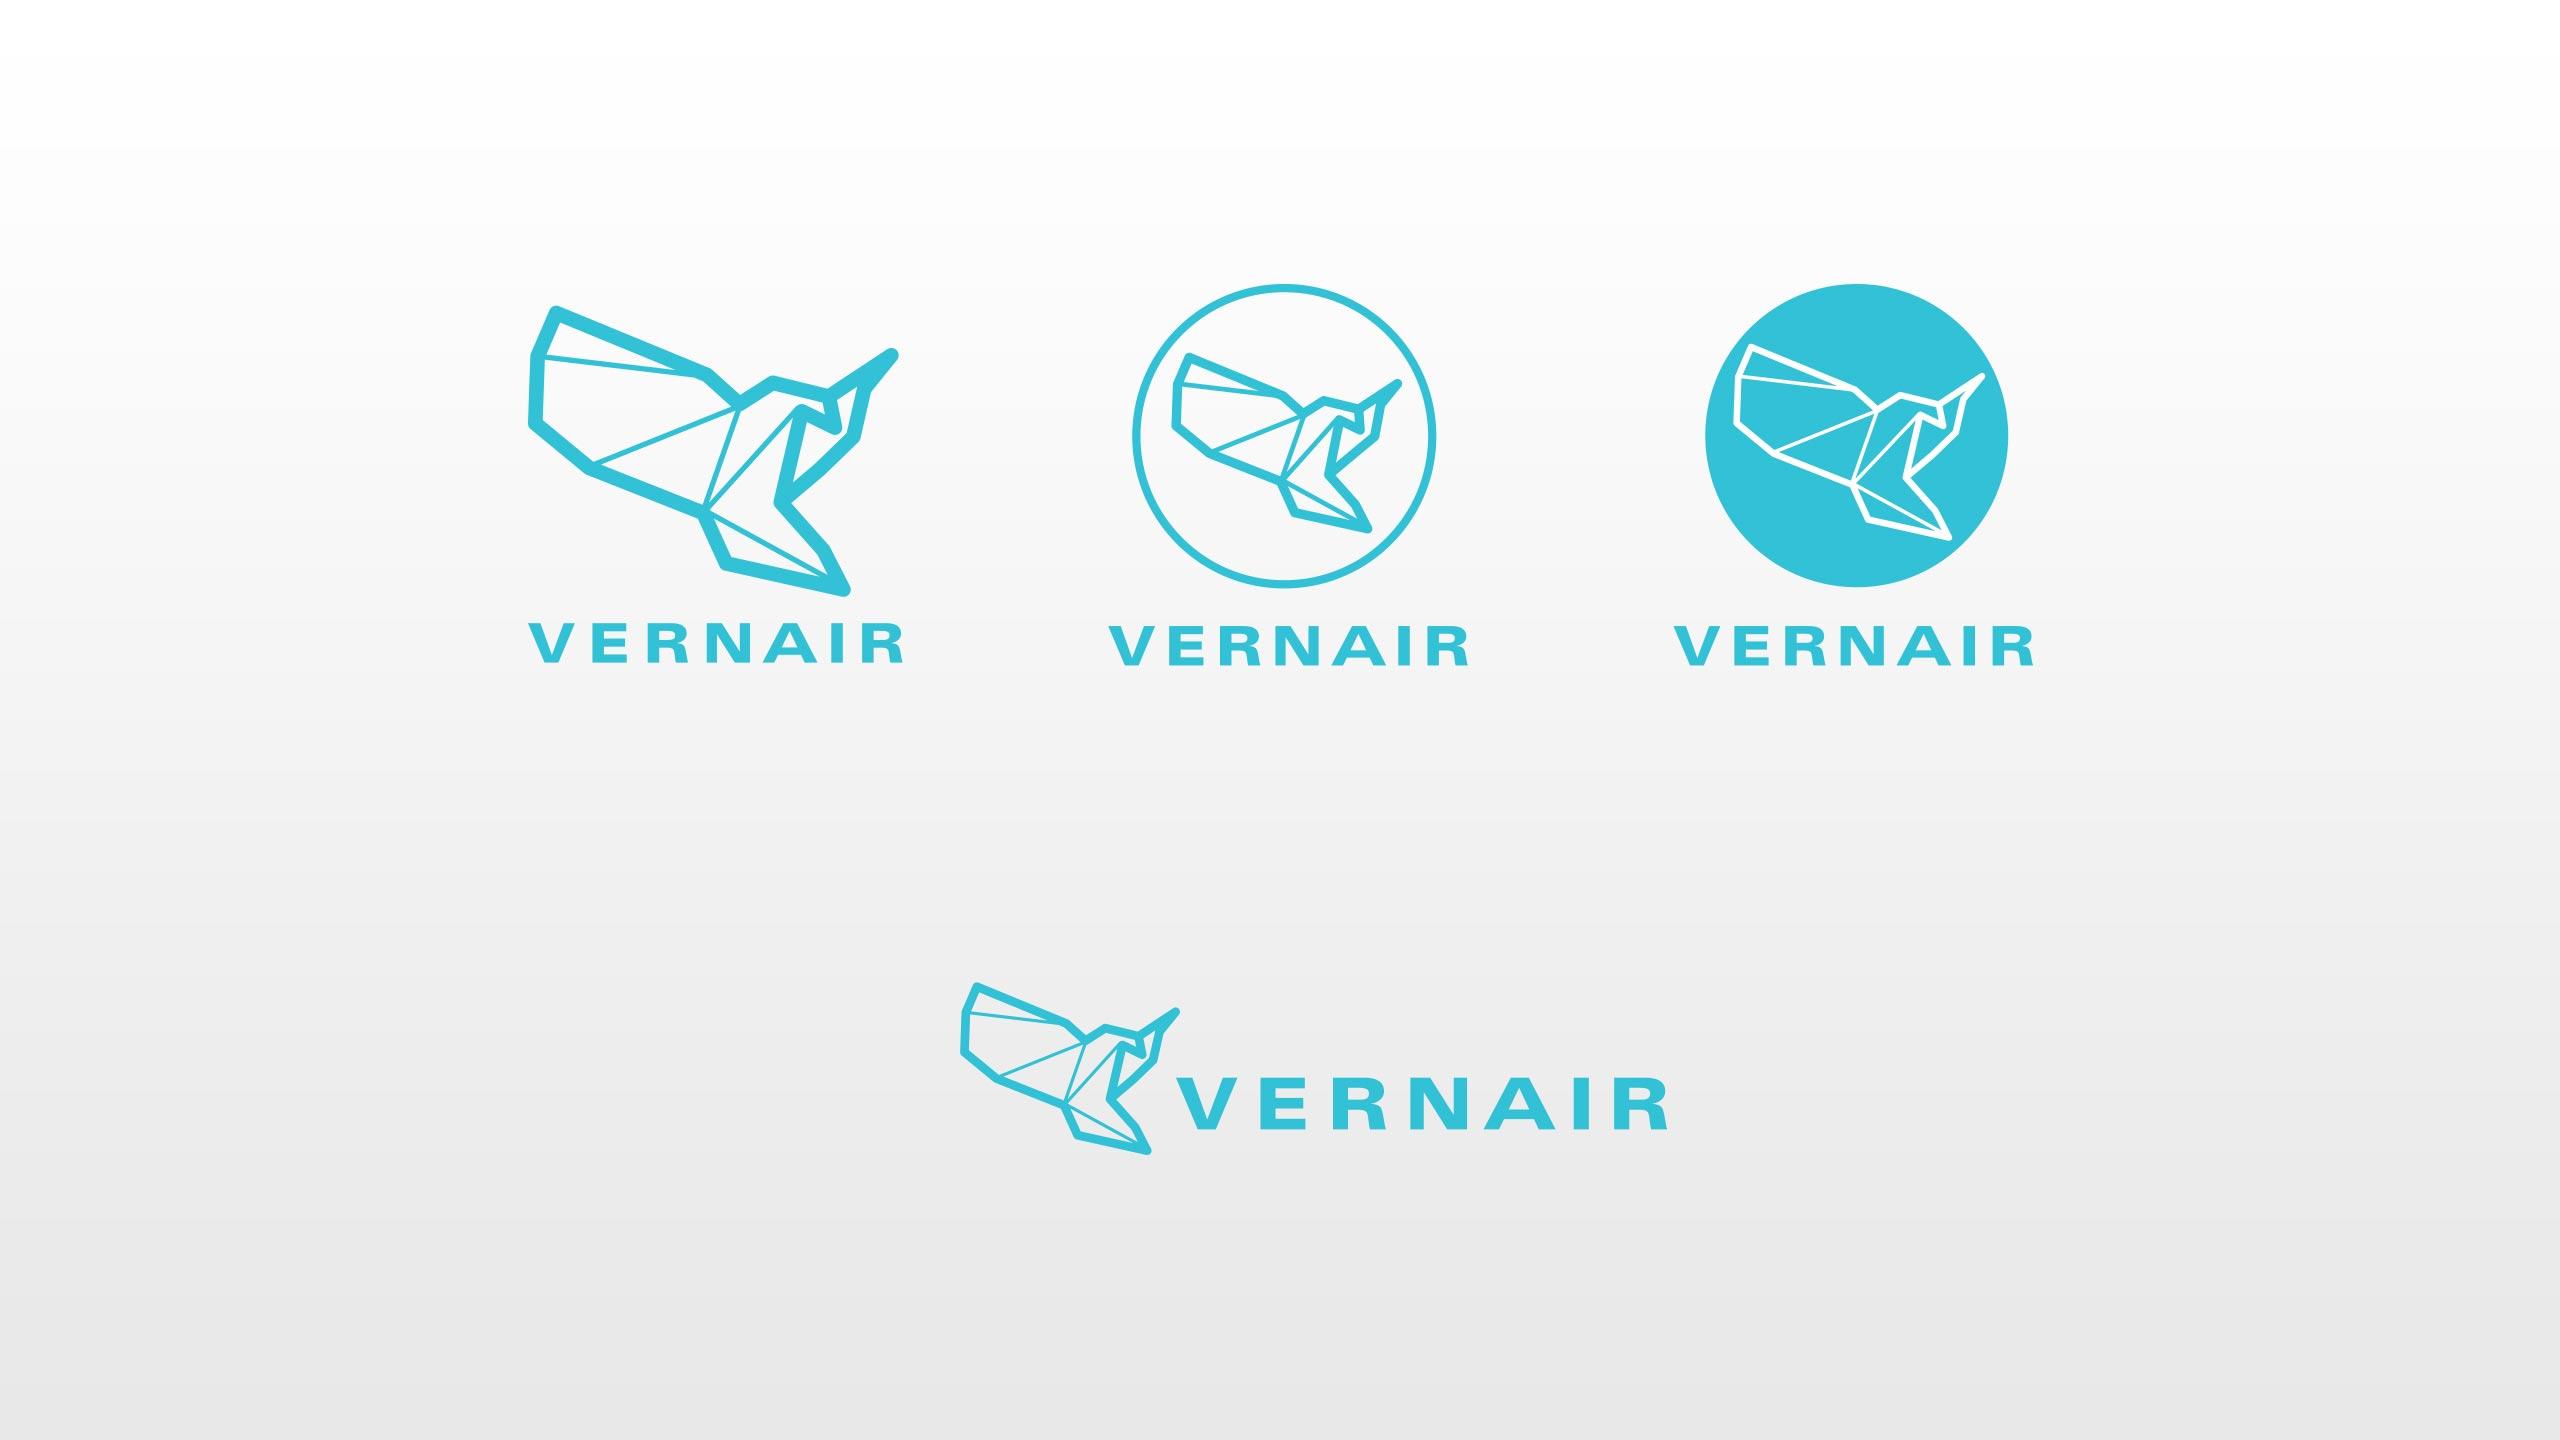 Vernair Airlines logos iterations